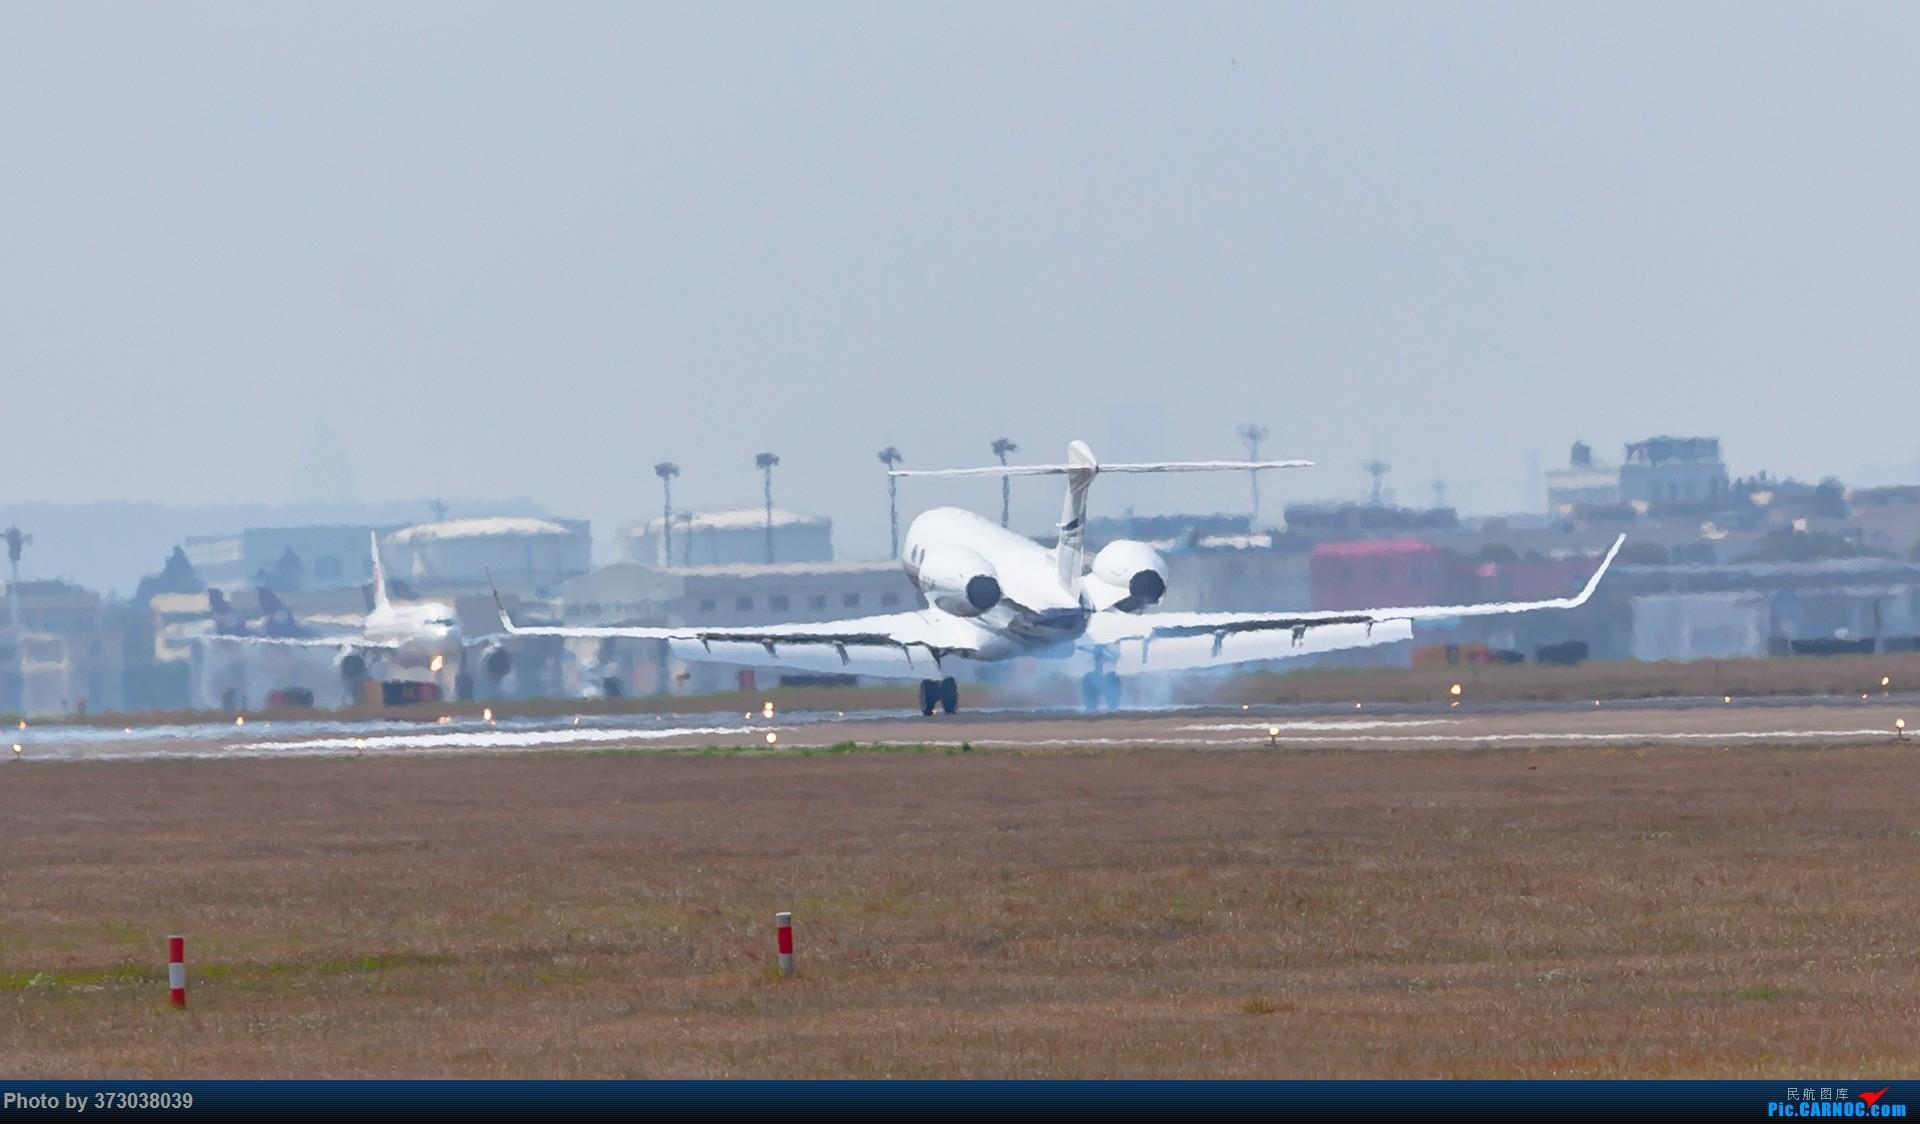 Re:[原创]HGH杭州萧山国际机场 落地的 公务机大佬们 湾流 GULFSTREAM G650 VP-CJR 中国杭州萧山国际机场